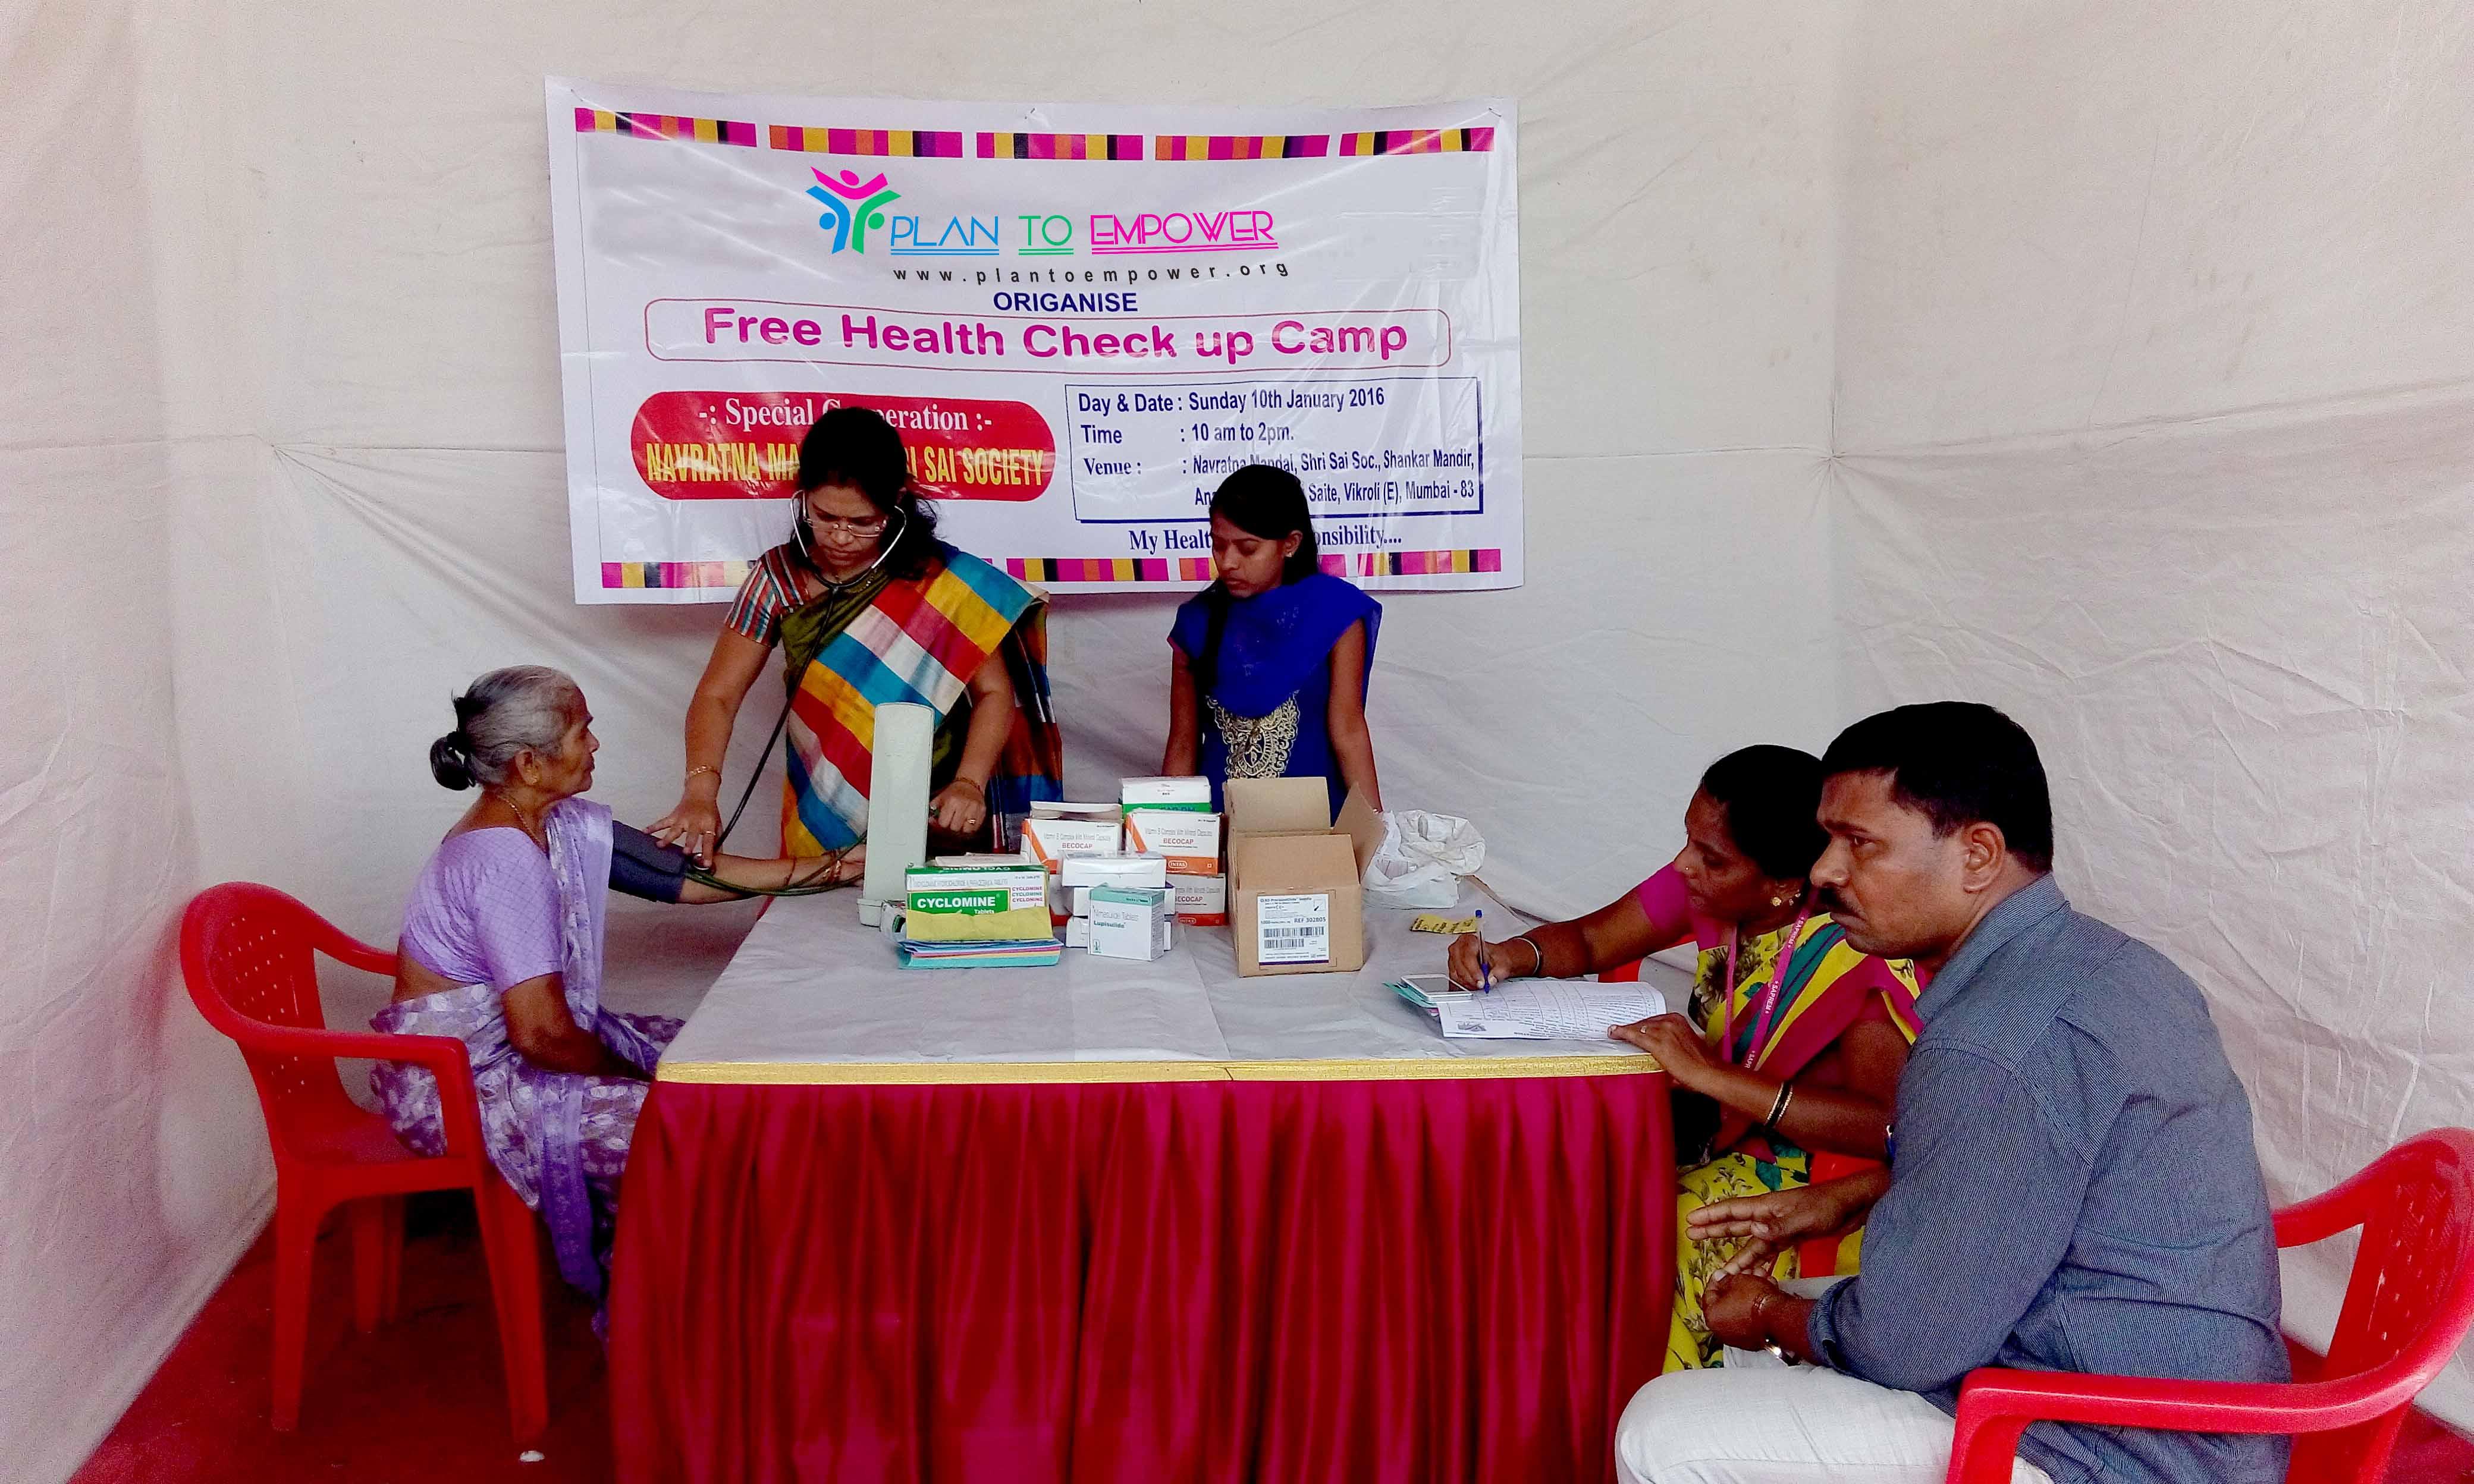 Free health check-ups